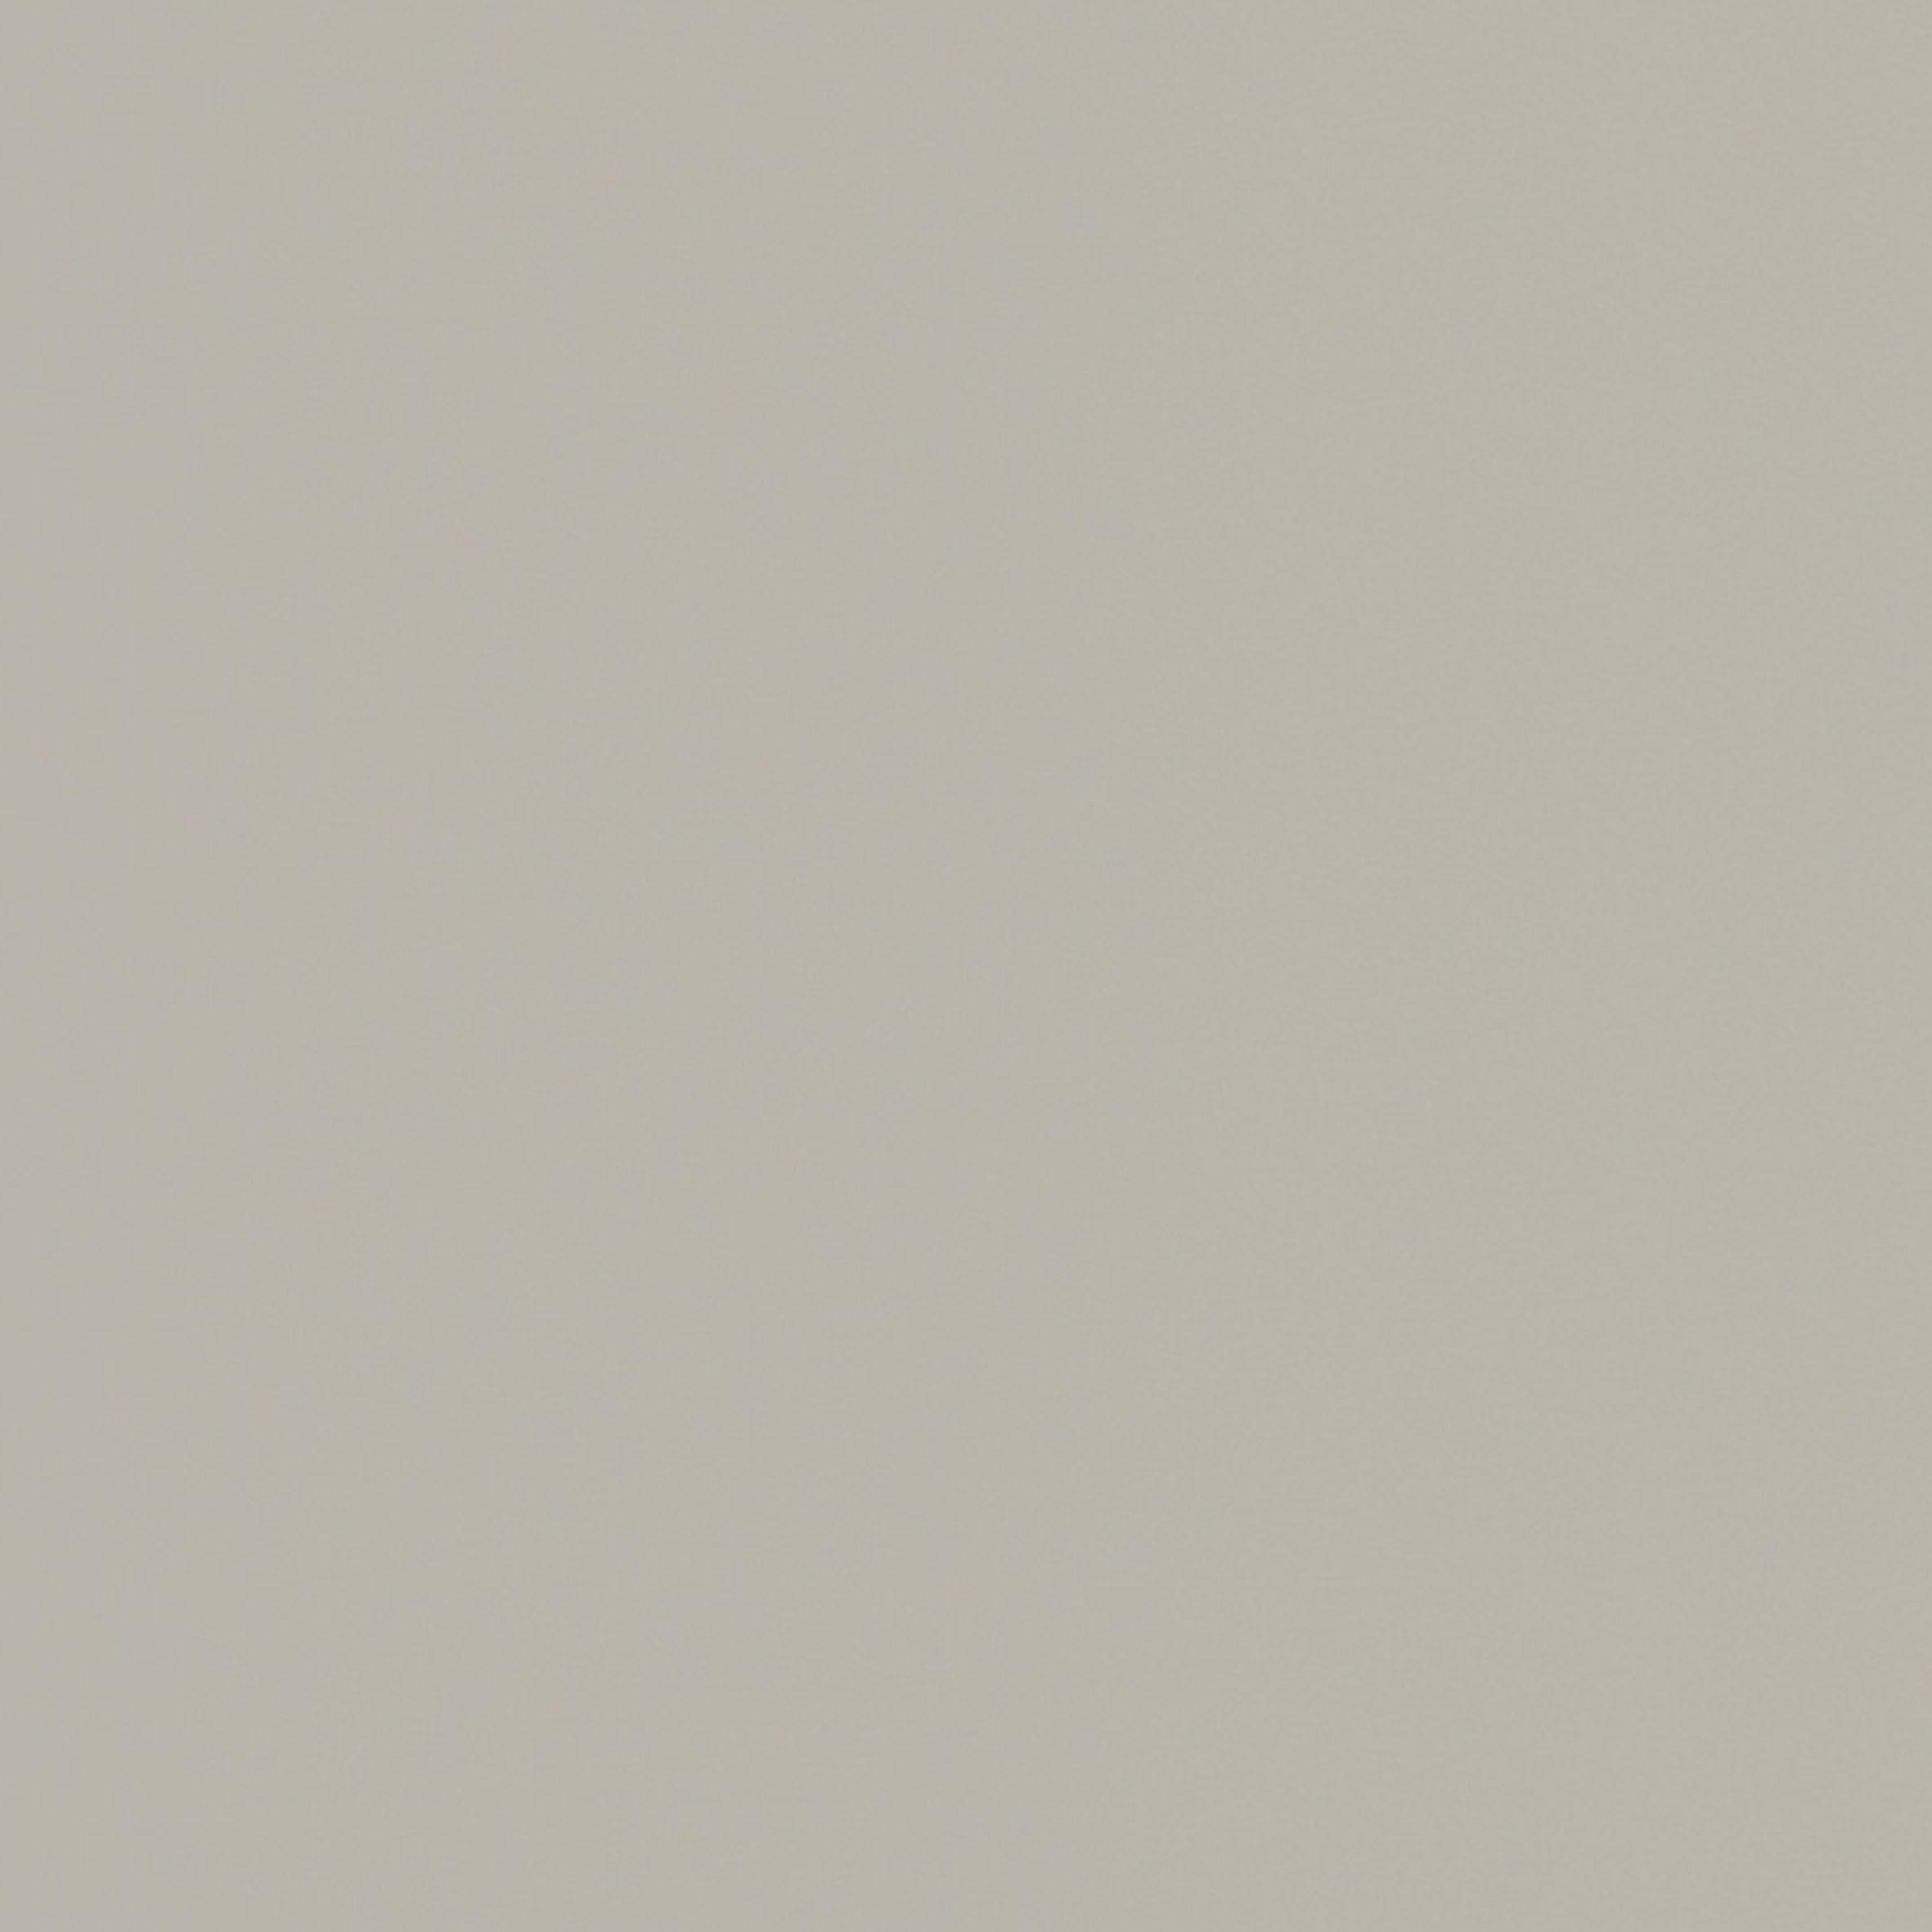 Cromatica Cenere Glossy 6mm 120 x 120